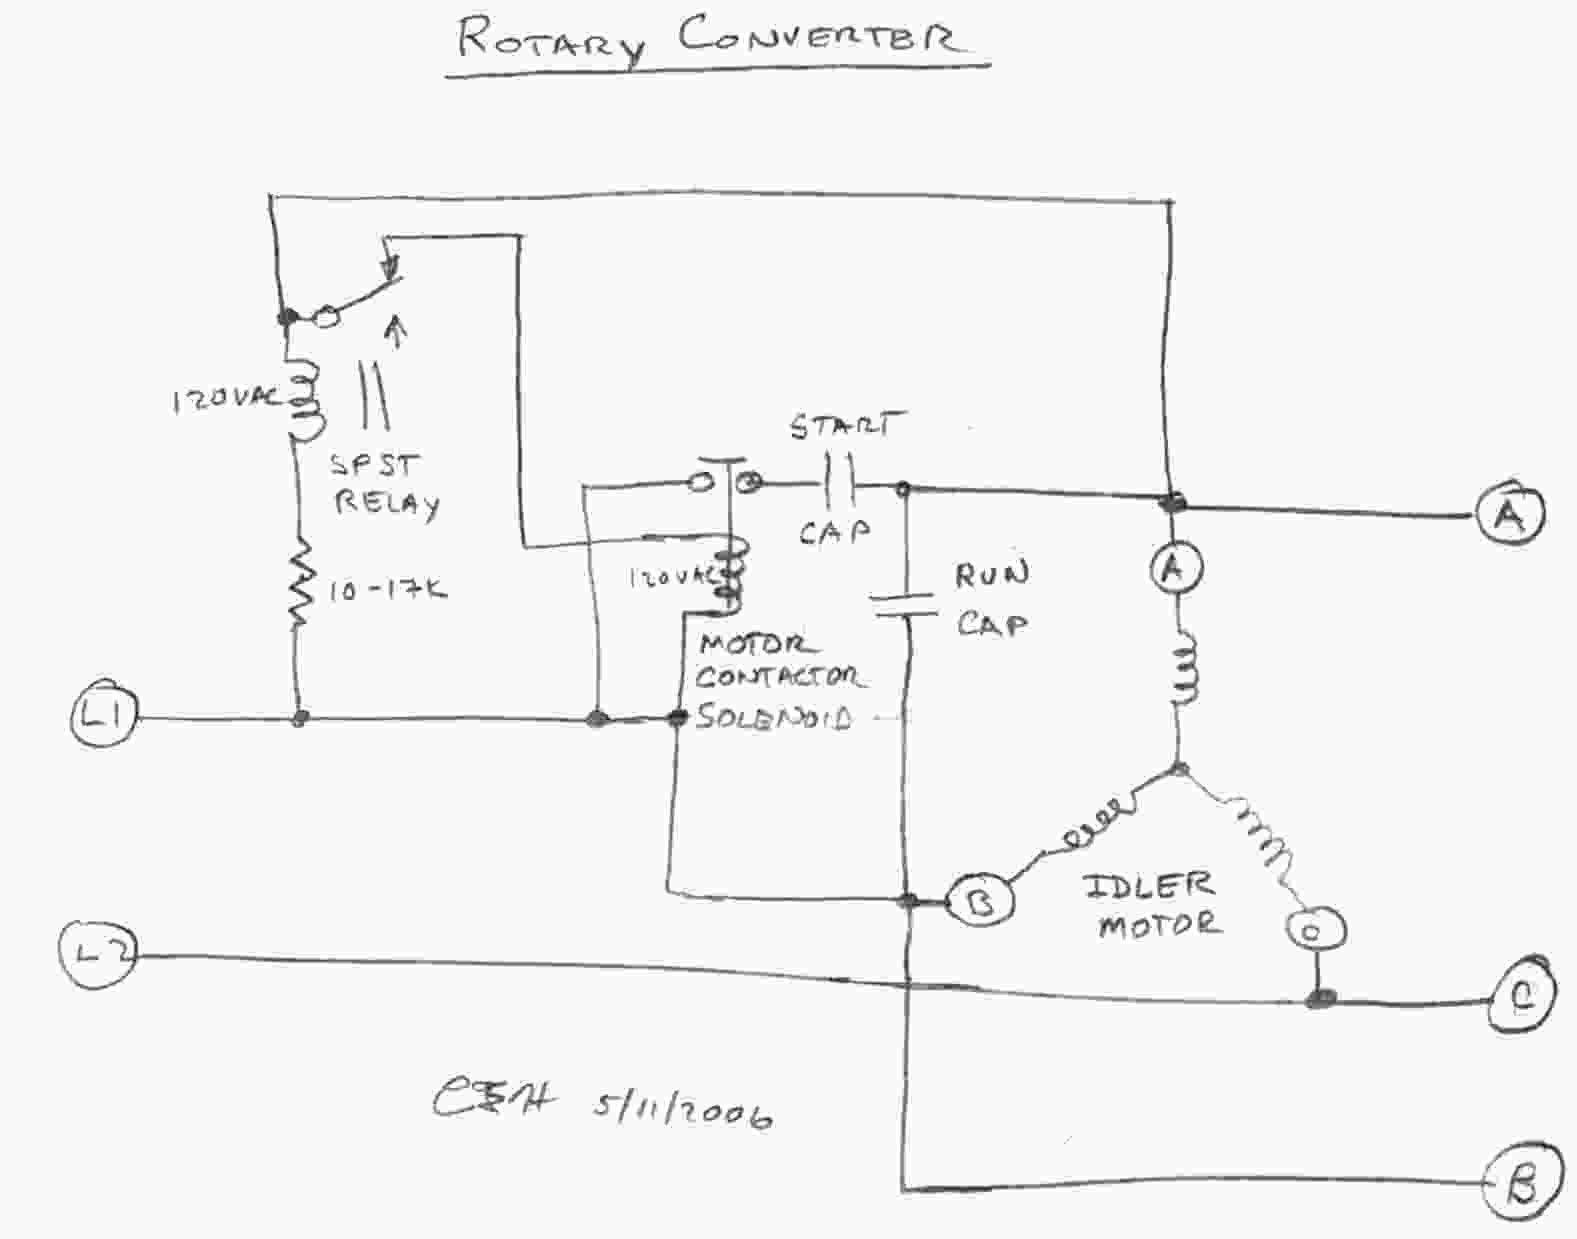 New Wiring Diagram Three Phase Generator Diagram Diagramsample Diagramtemplate Wiringdiagram Diagram Electrical Circuit Diagram Diagram Electrical Diagram